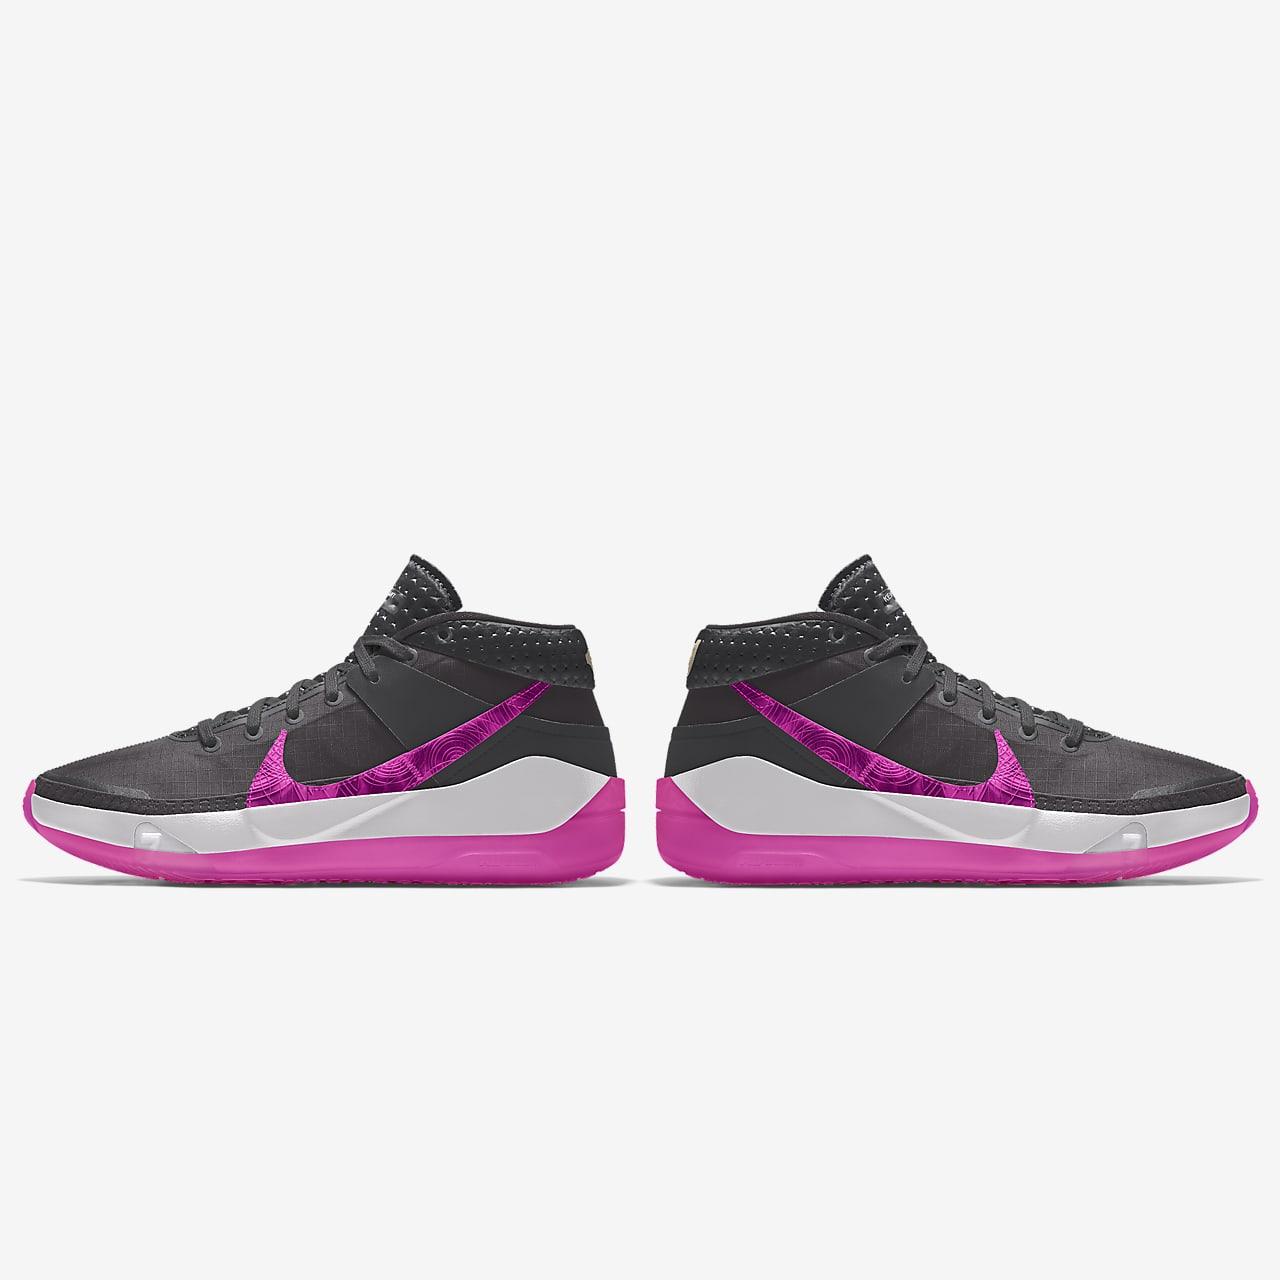 nike free custom shoes